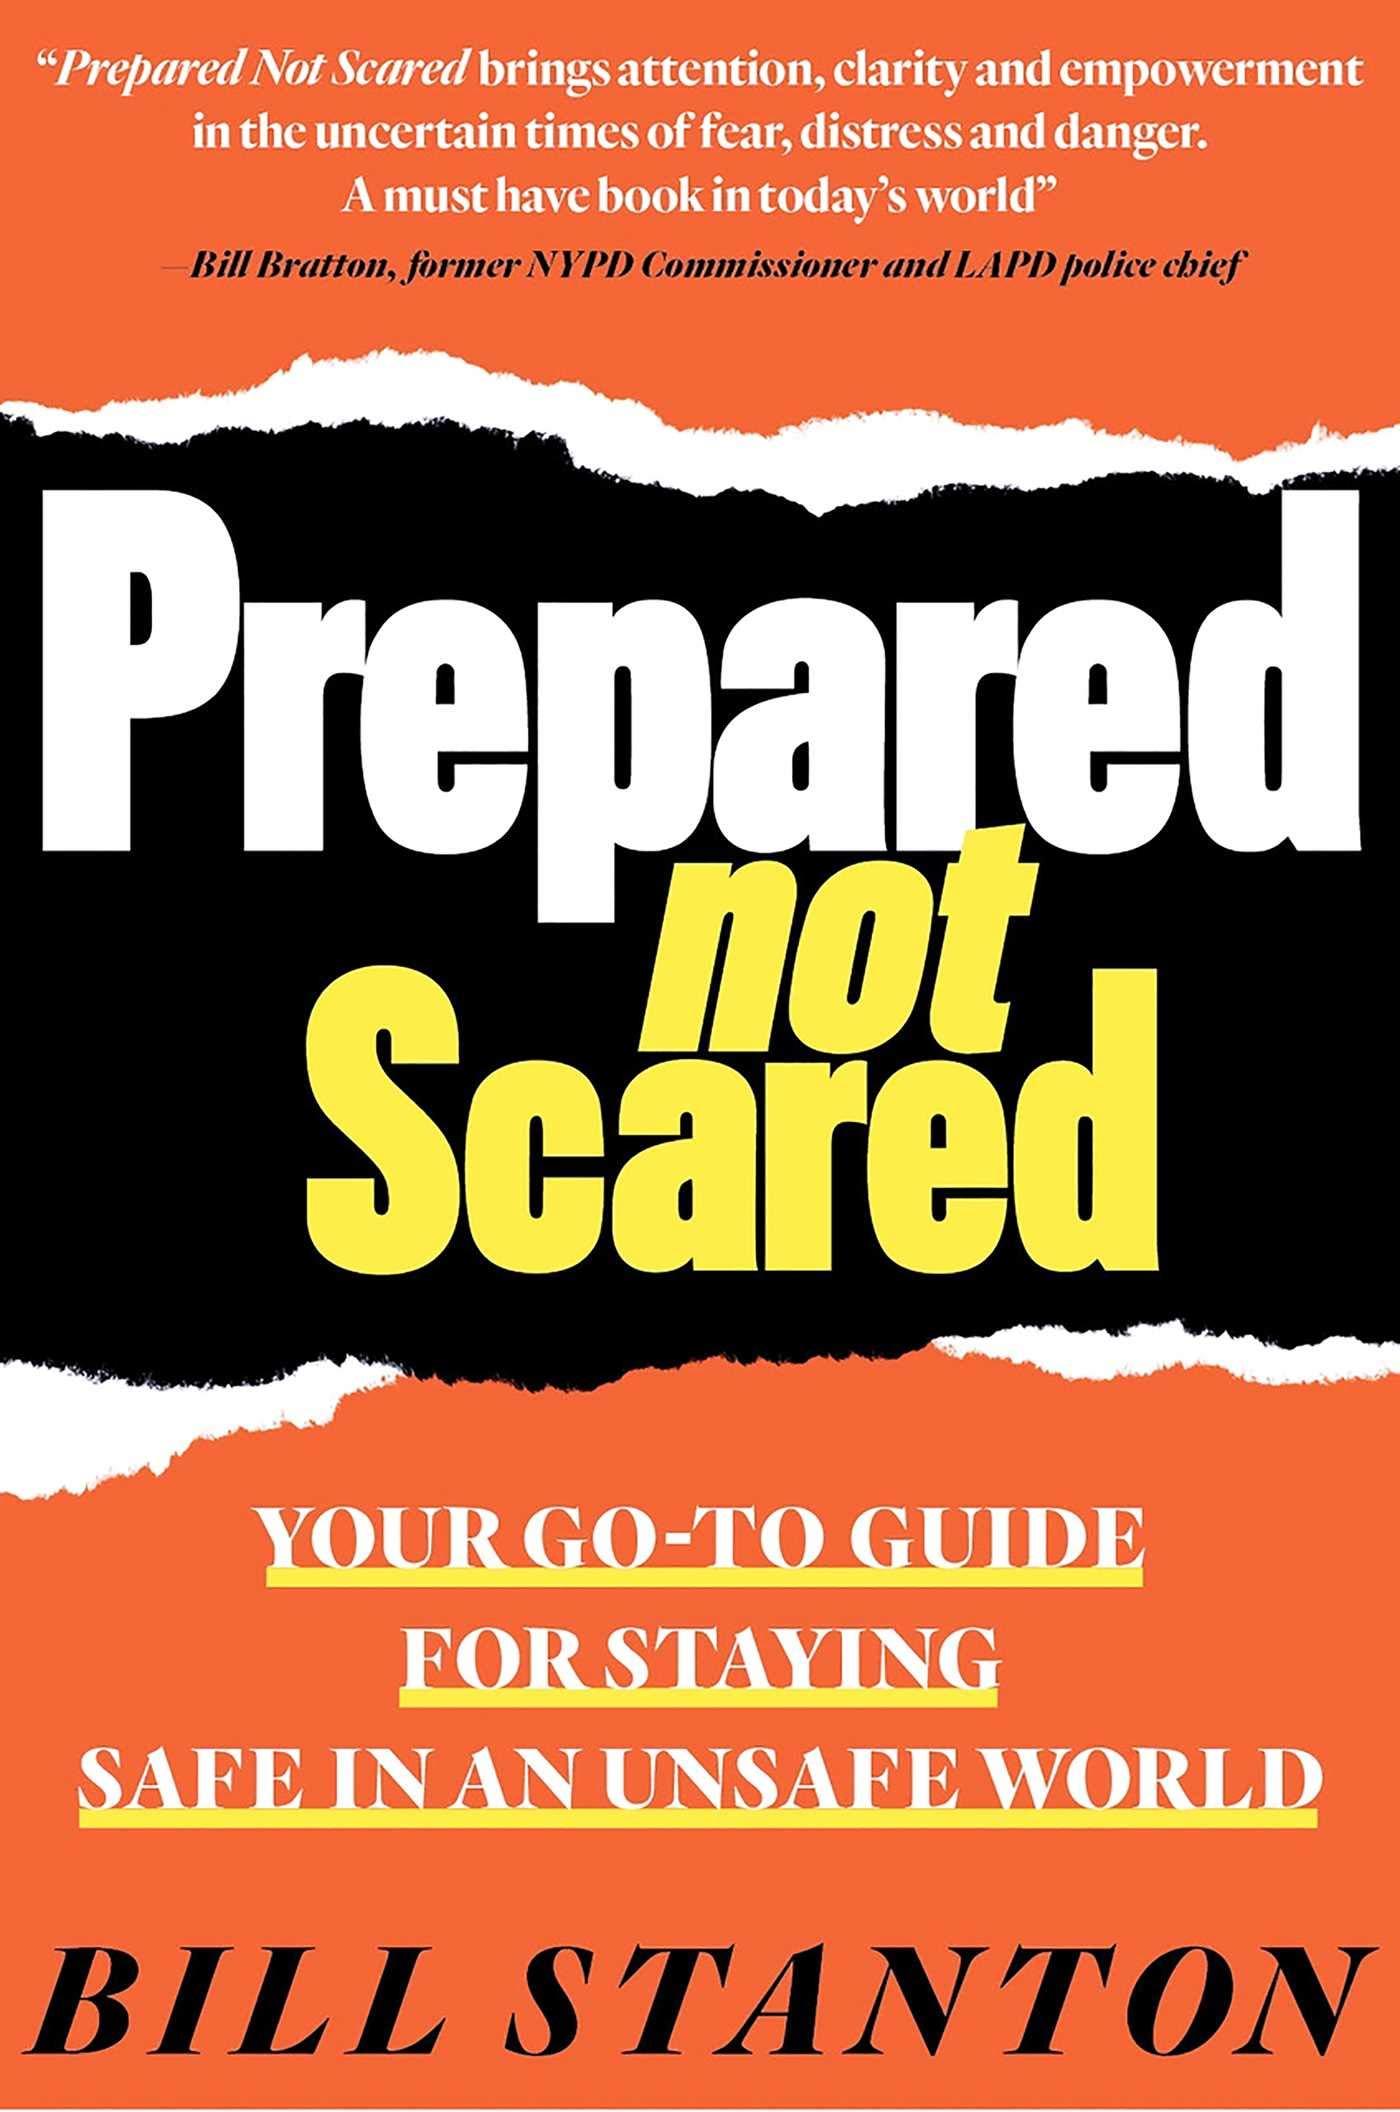 PreparedNotScaredCover.jpg